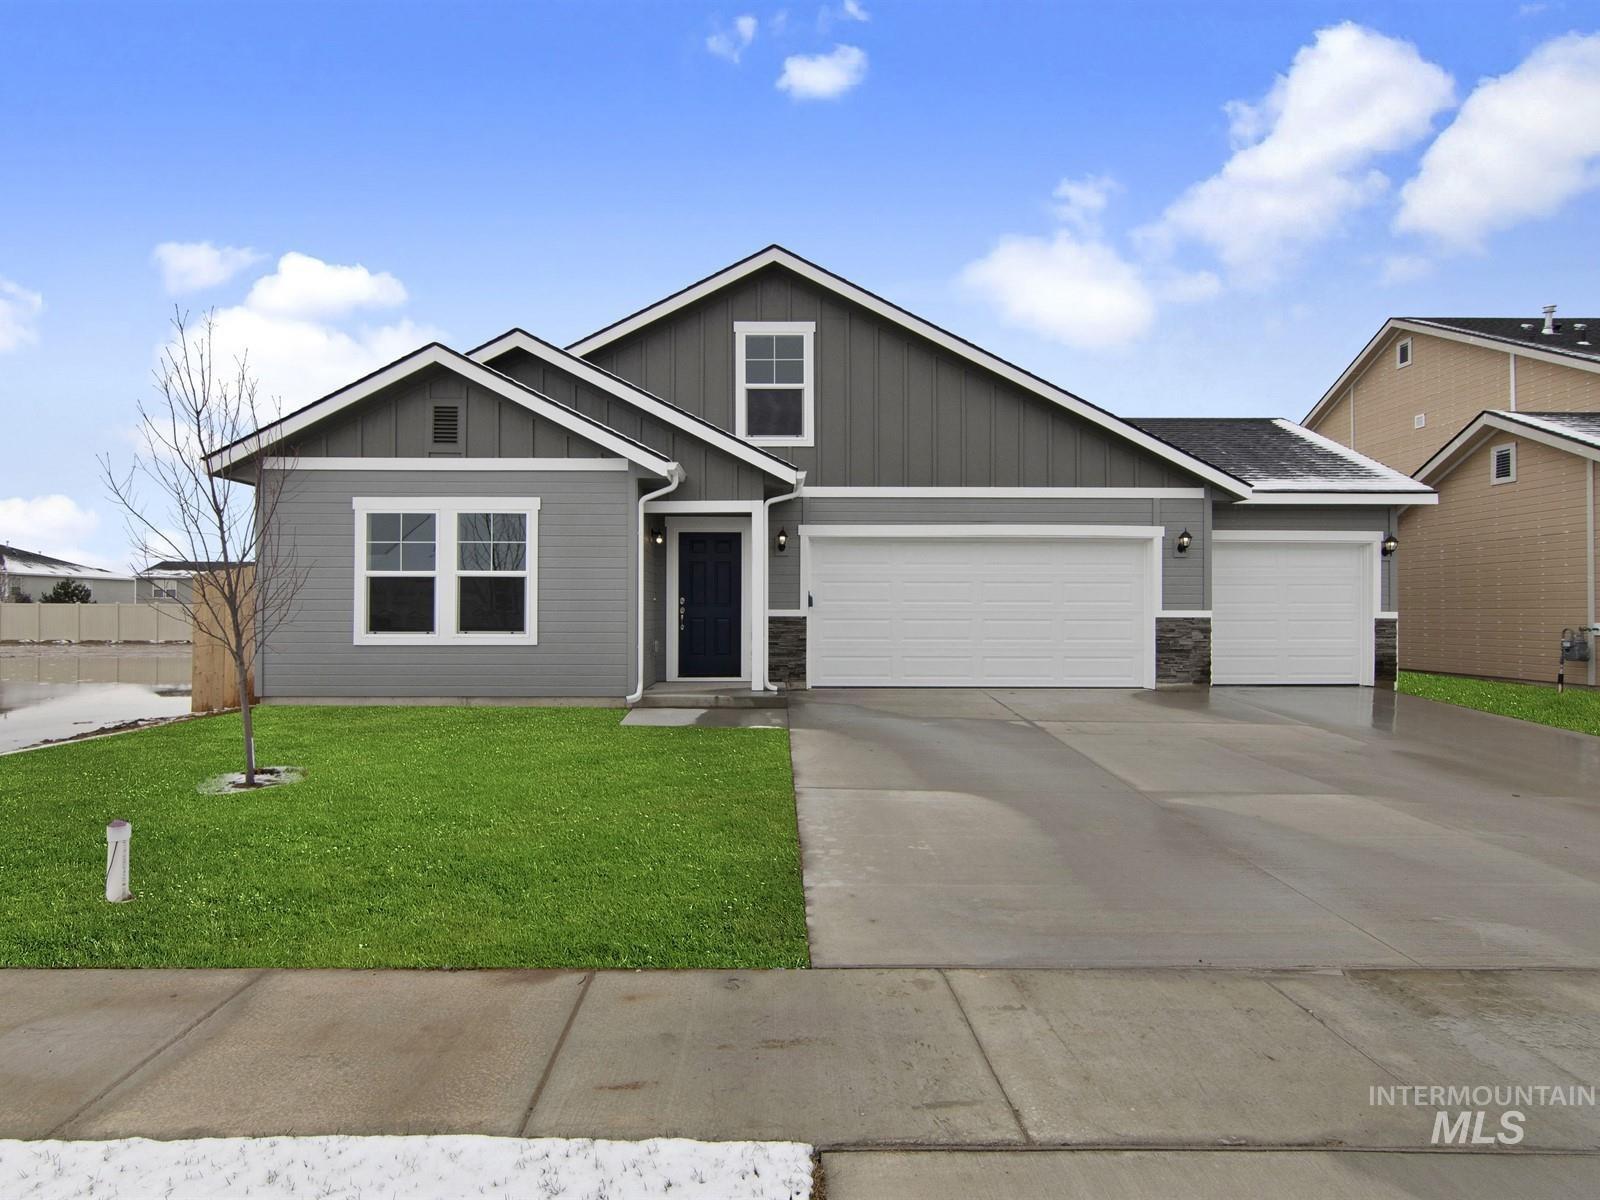 2328 Mariner Ave Property Photo - Middleton, ID real estate listing